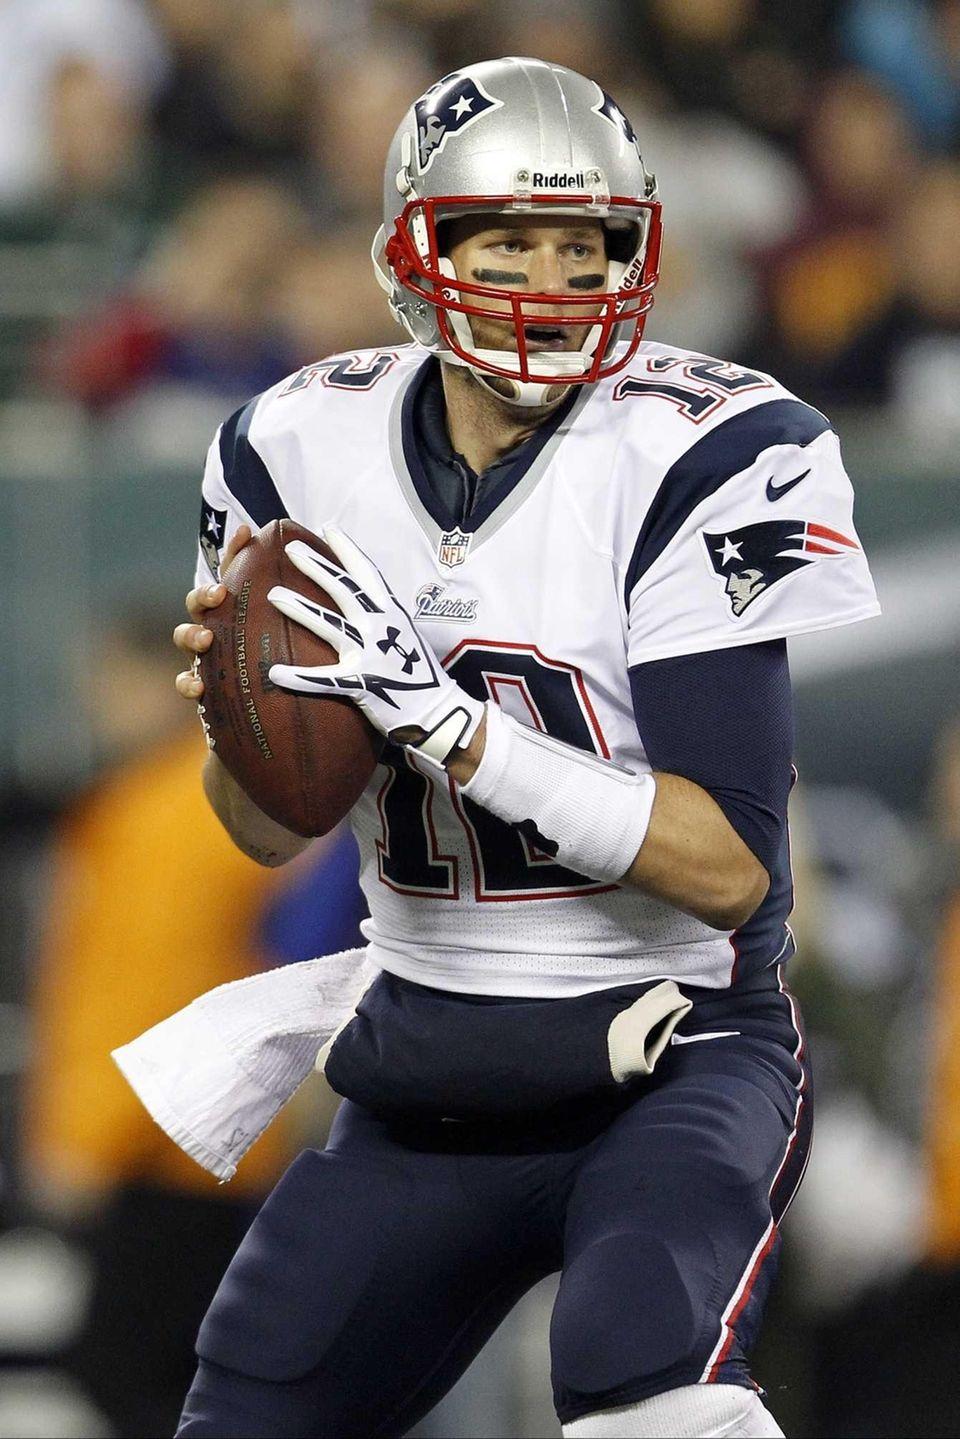 New England Patriots quarterback Tom Brady looks to